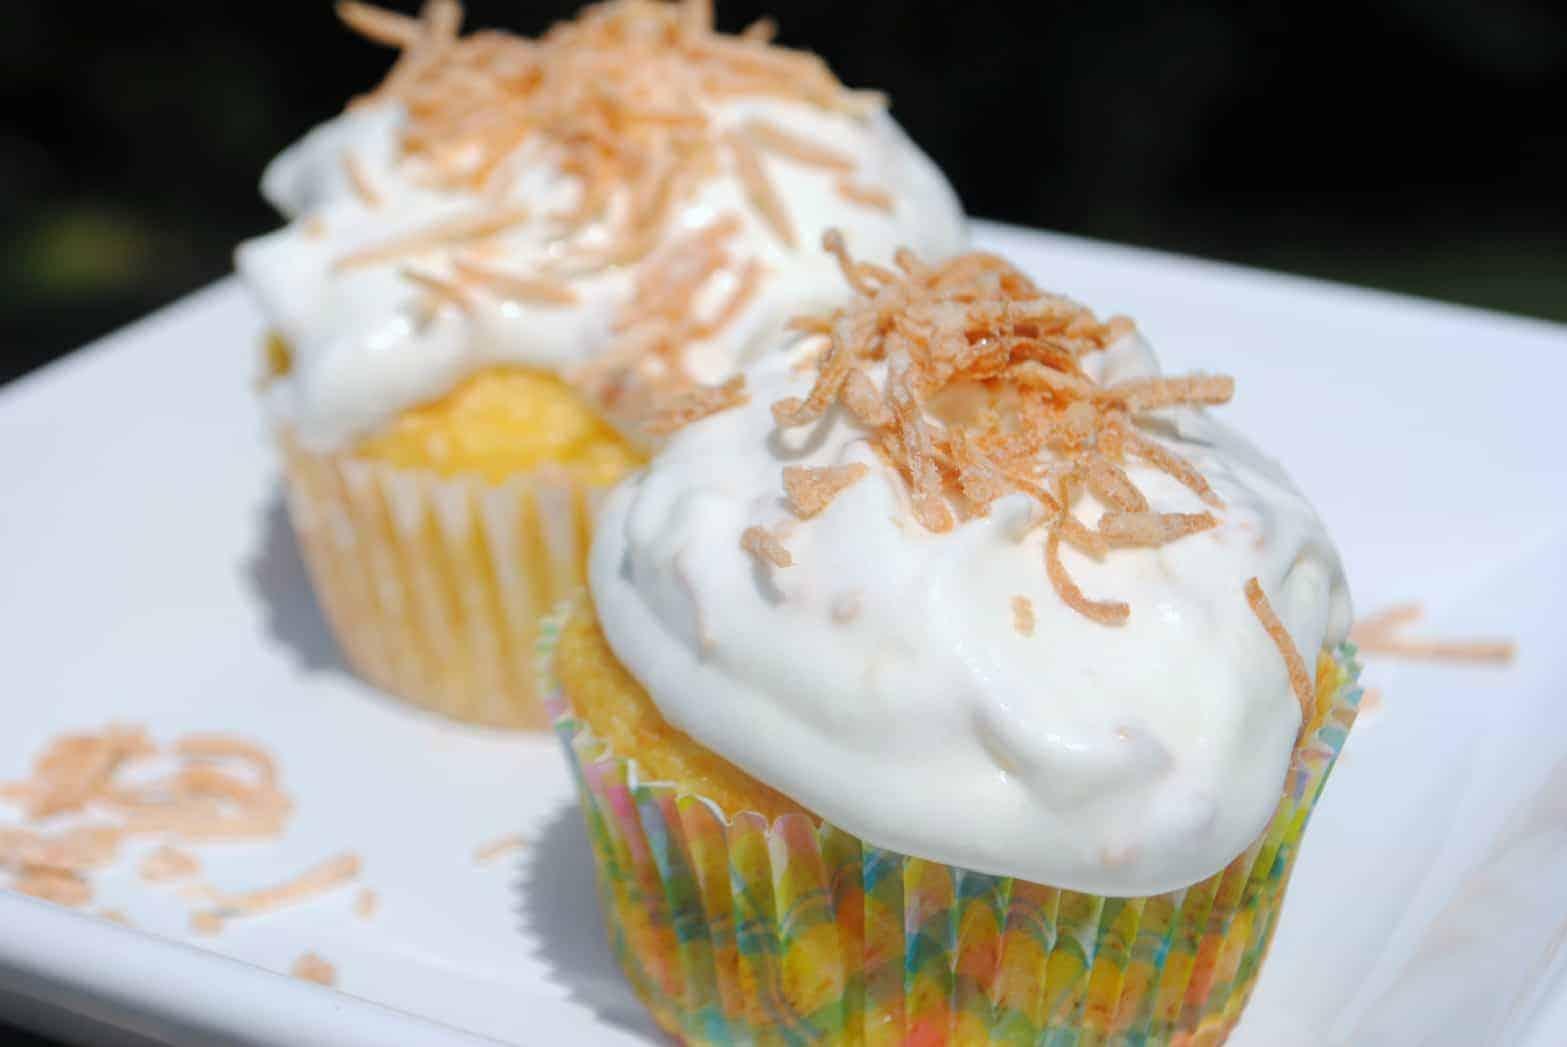 Cakes / Cupcakes on Pinterest | Banana Cupcakes, Cupcake and Chocolate ...